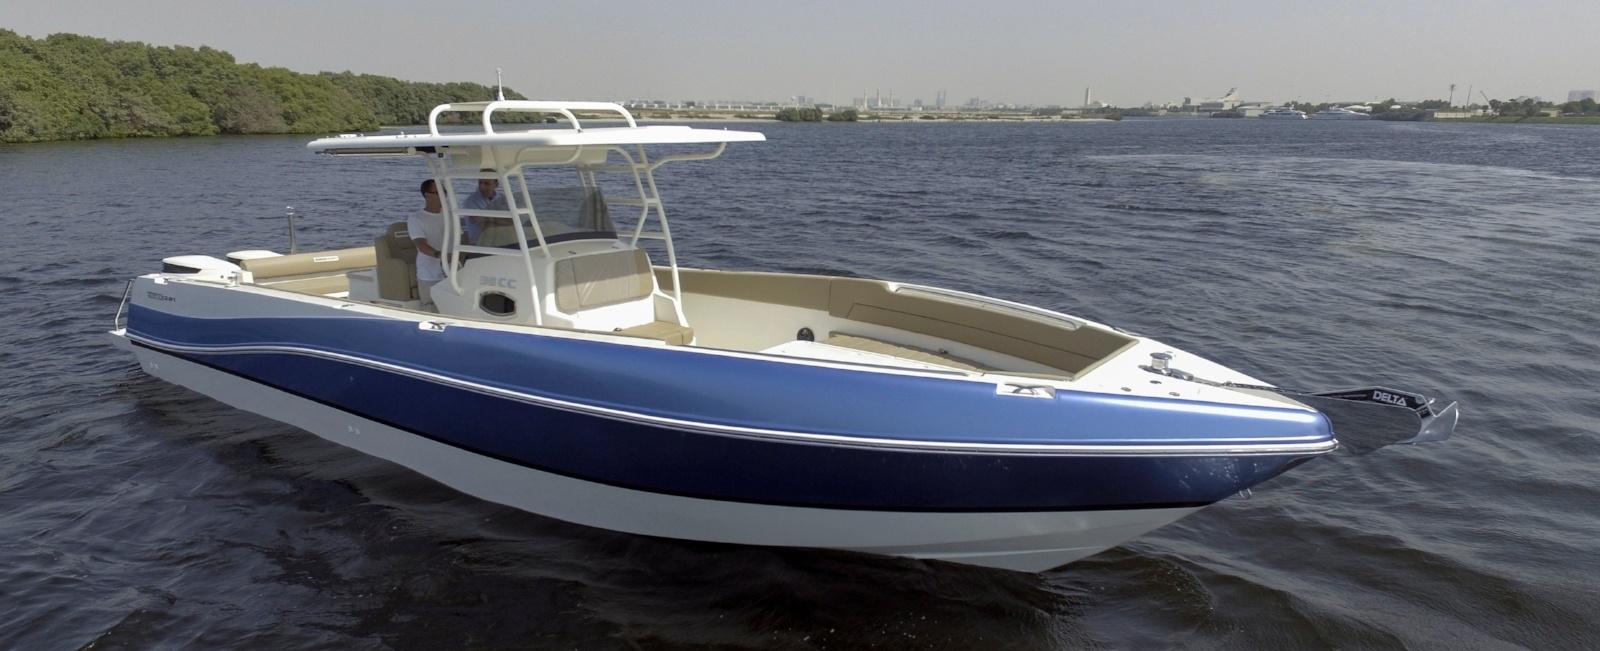 Silvercraft 36 CC #011 Cobalt Blue (9)-672537-edited